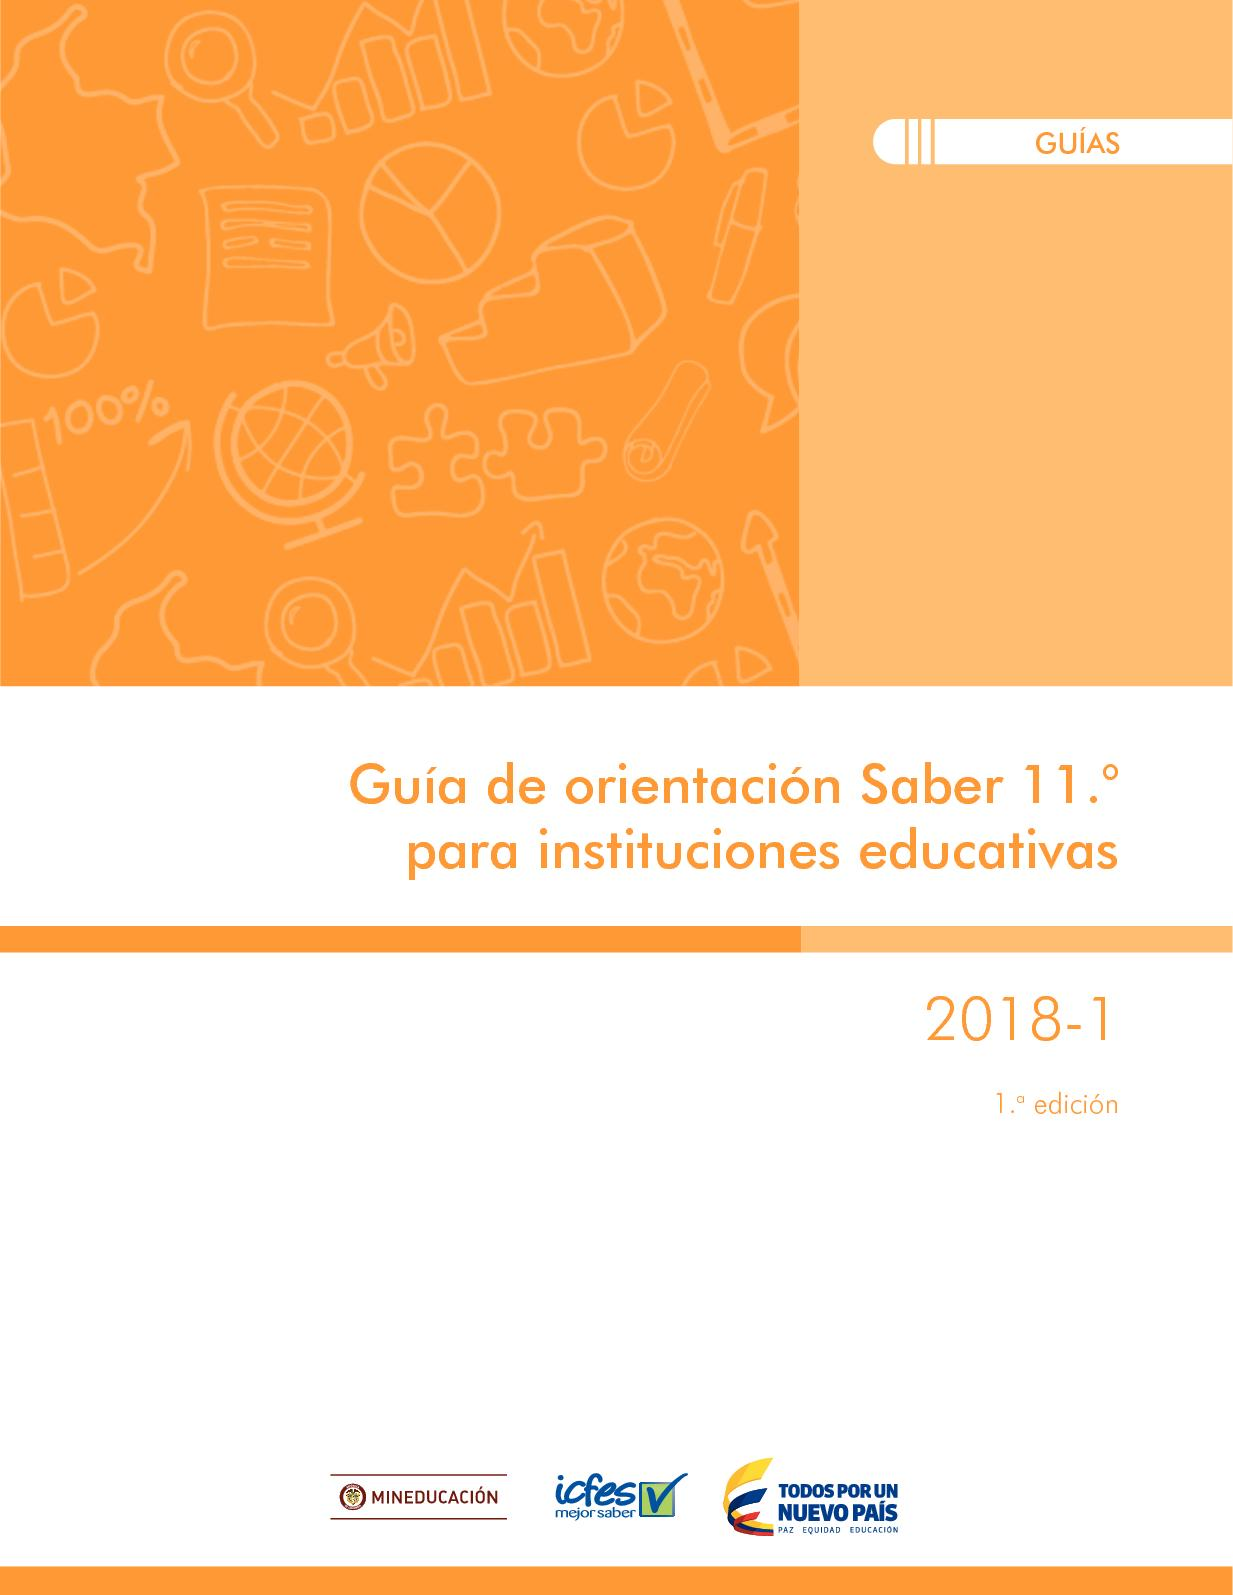 Guia De Orientacion Saber 11 Para Instituciones Educativas 2018 1